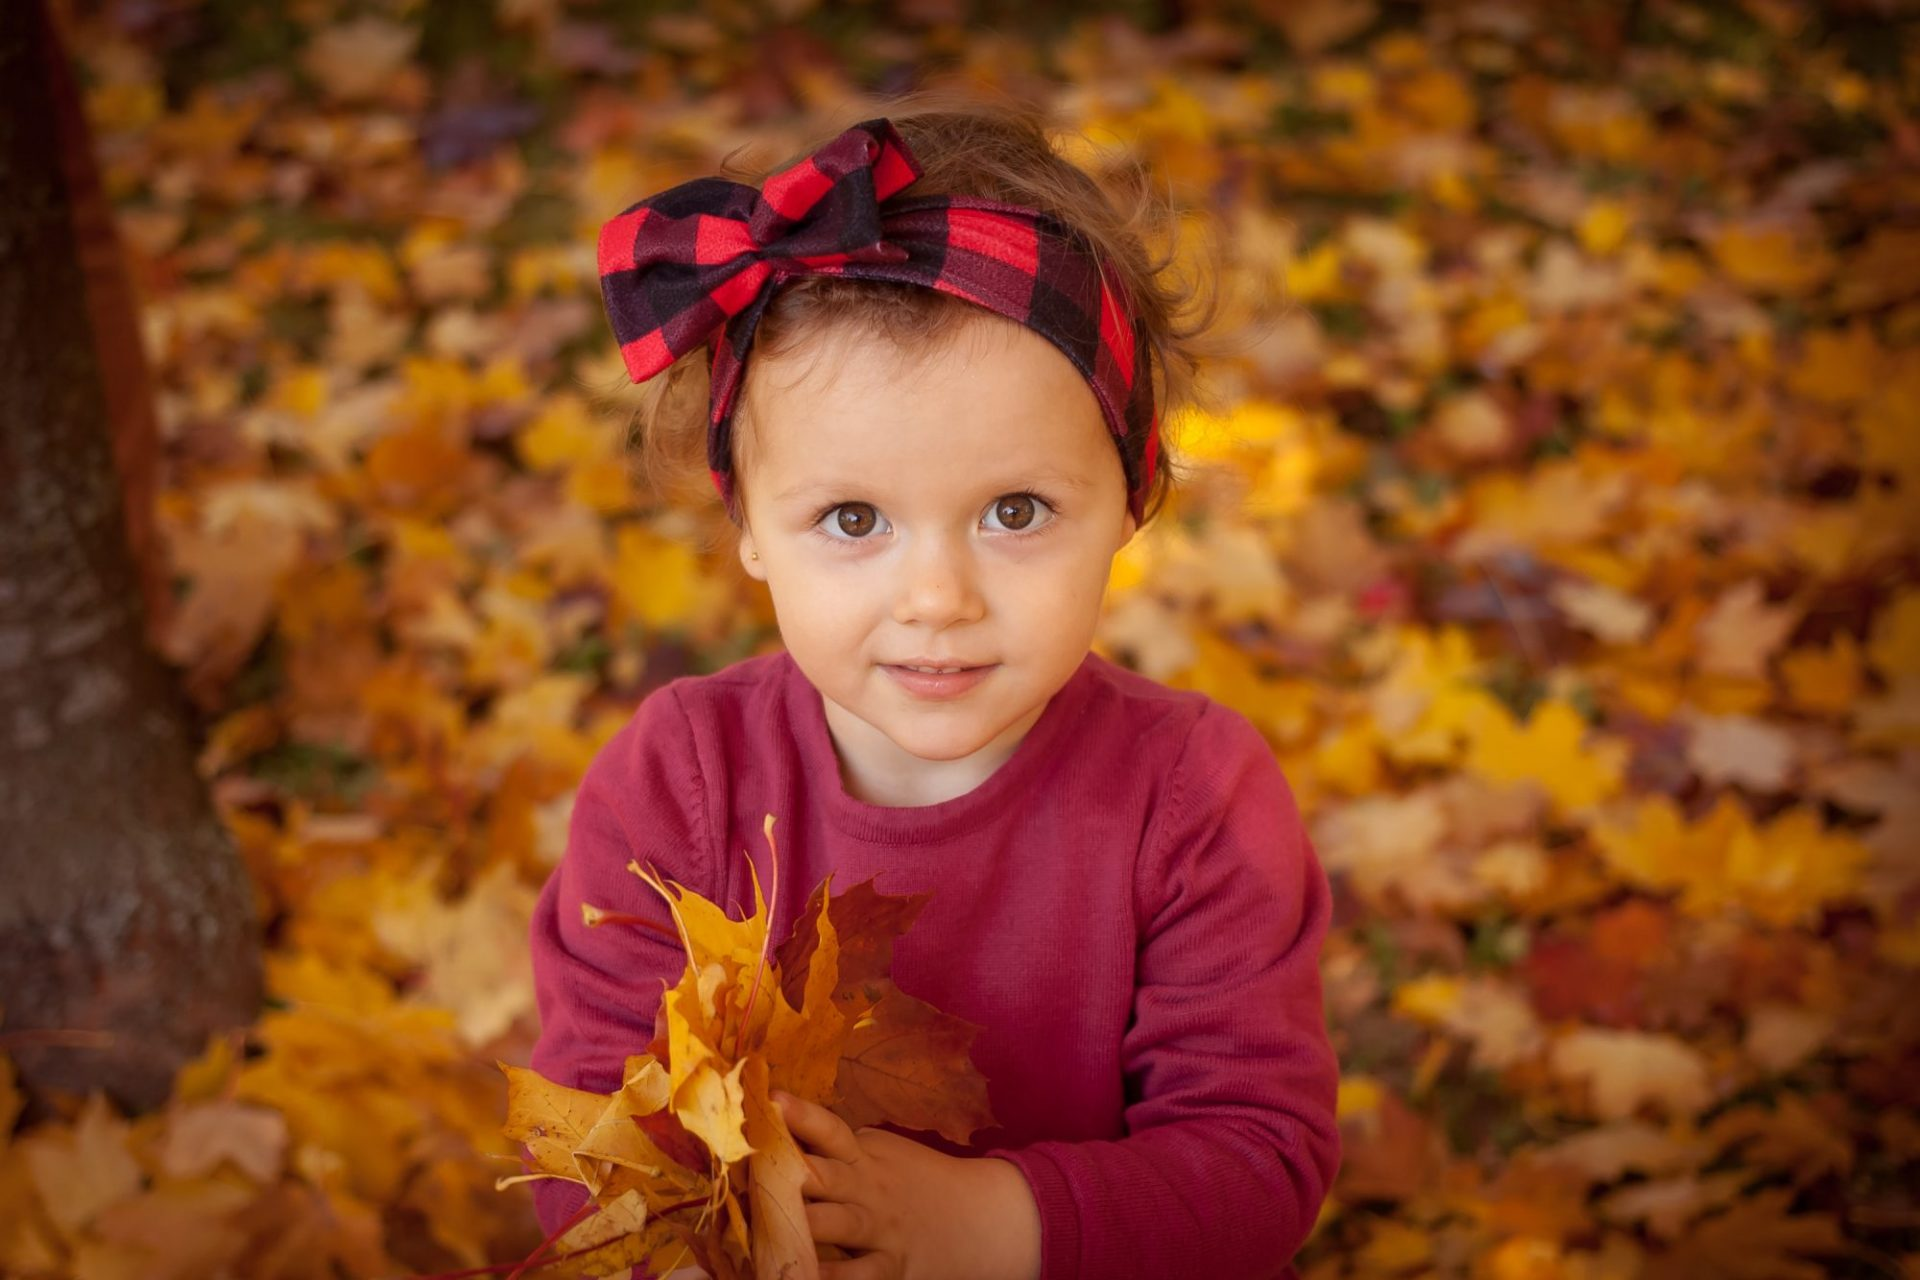 Poem – My Lost Love (daughter?) #parentalalienation